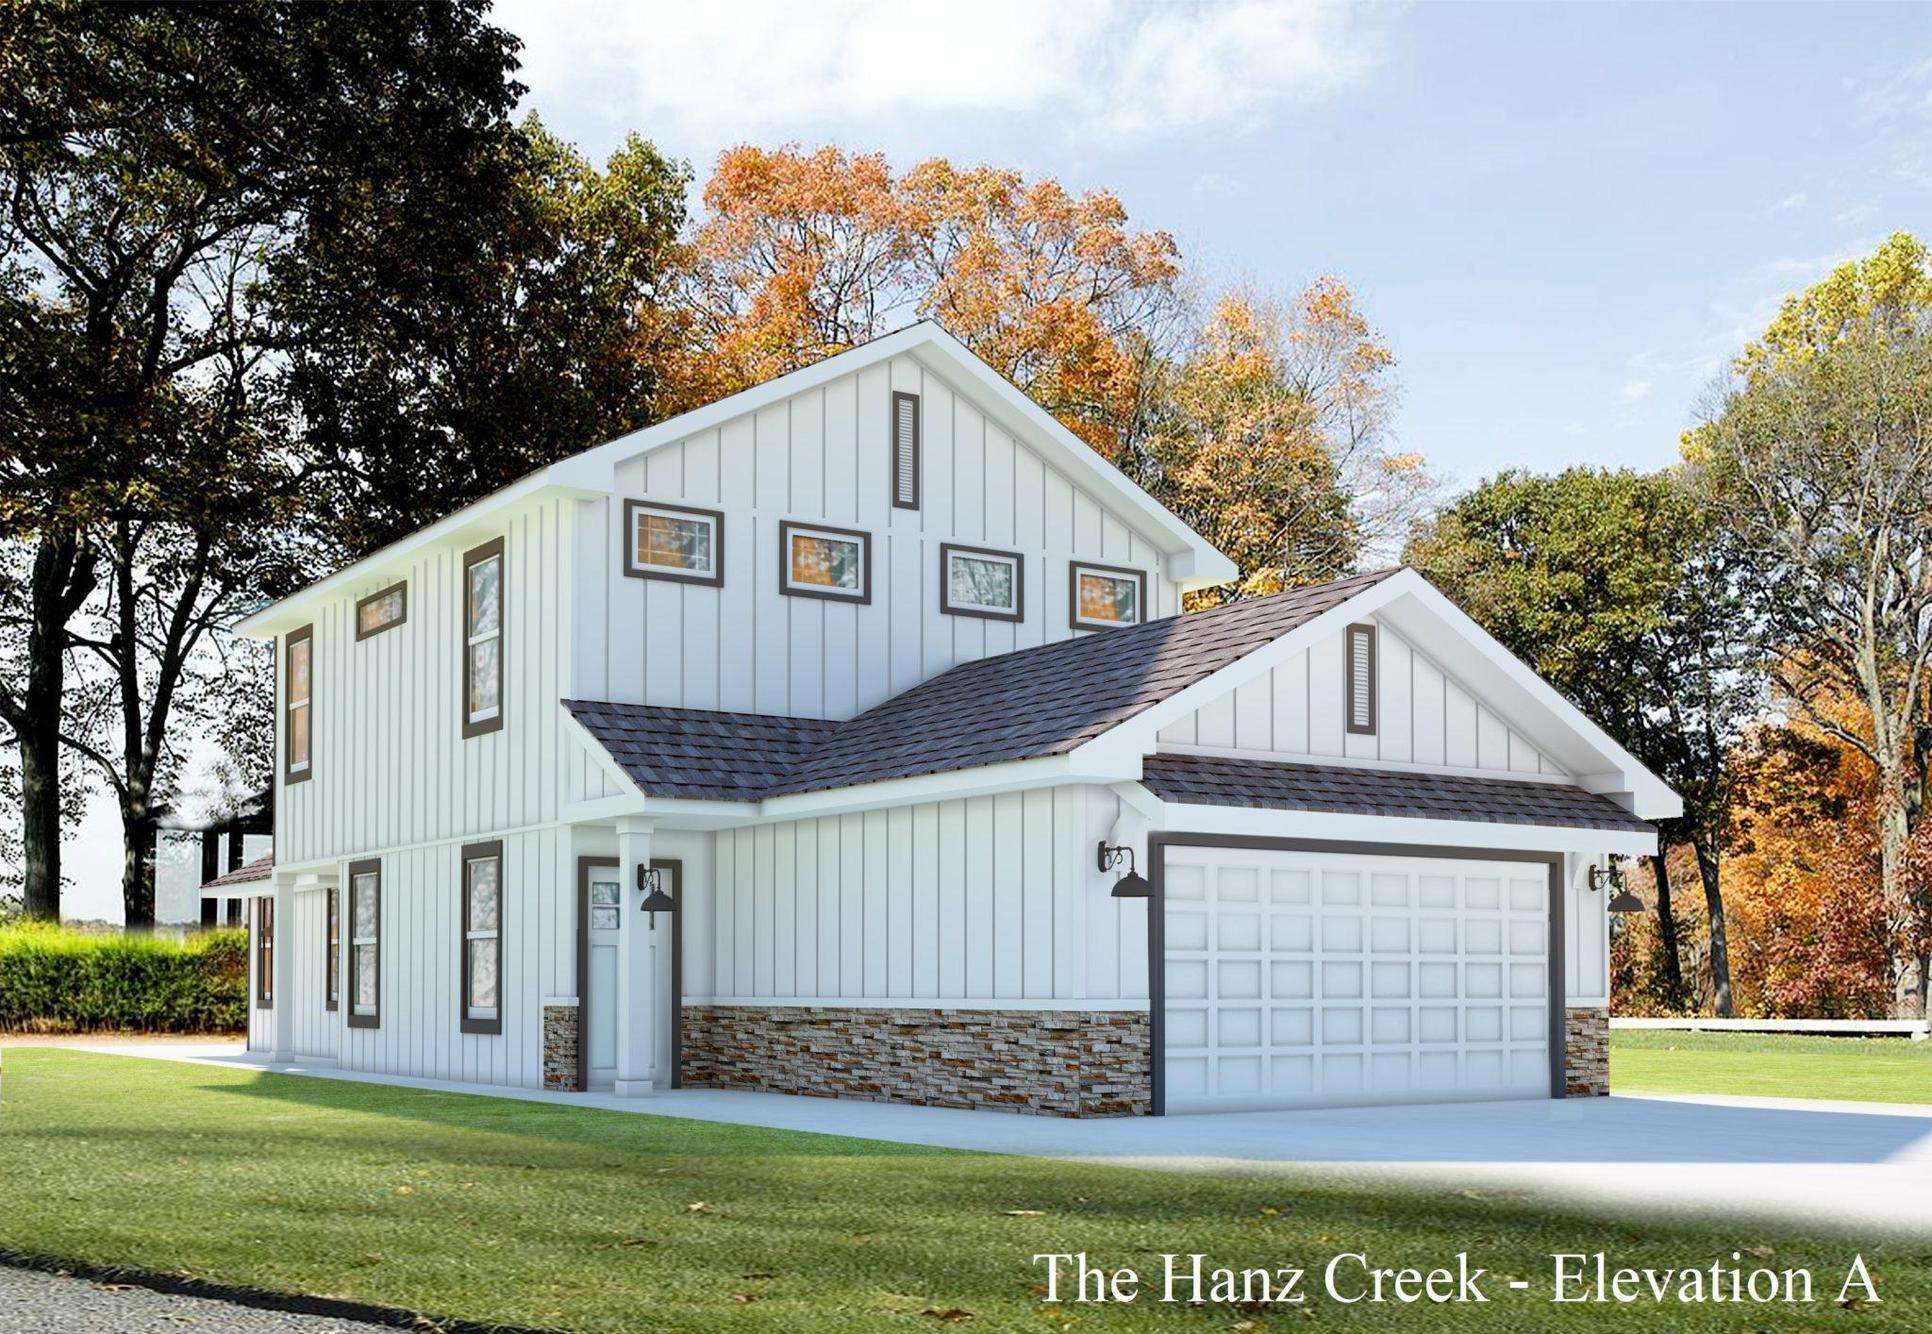 Modern Farmhouse:Elevation Image A